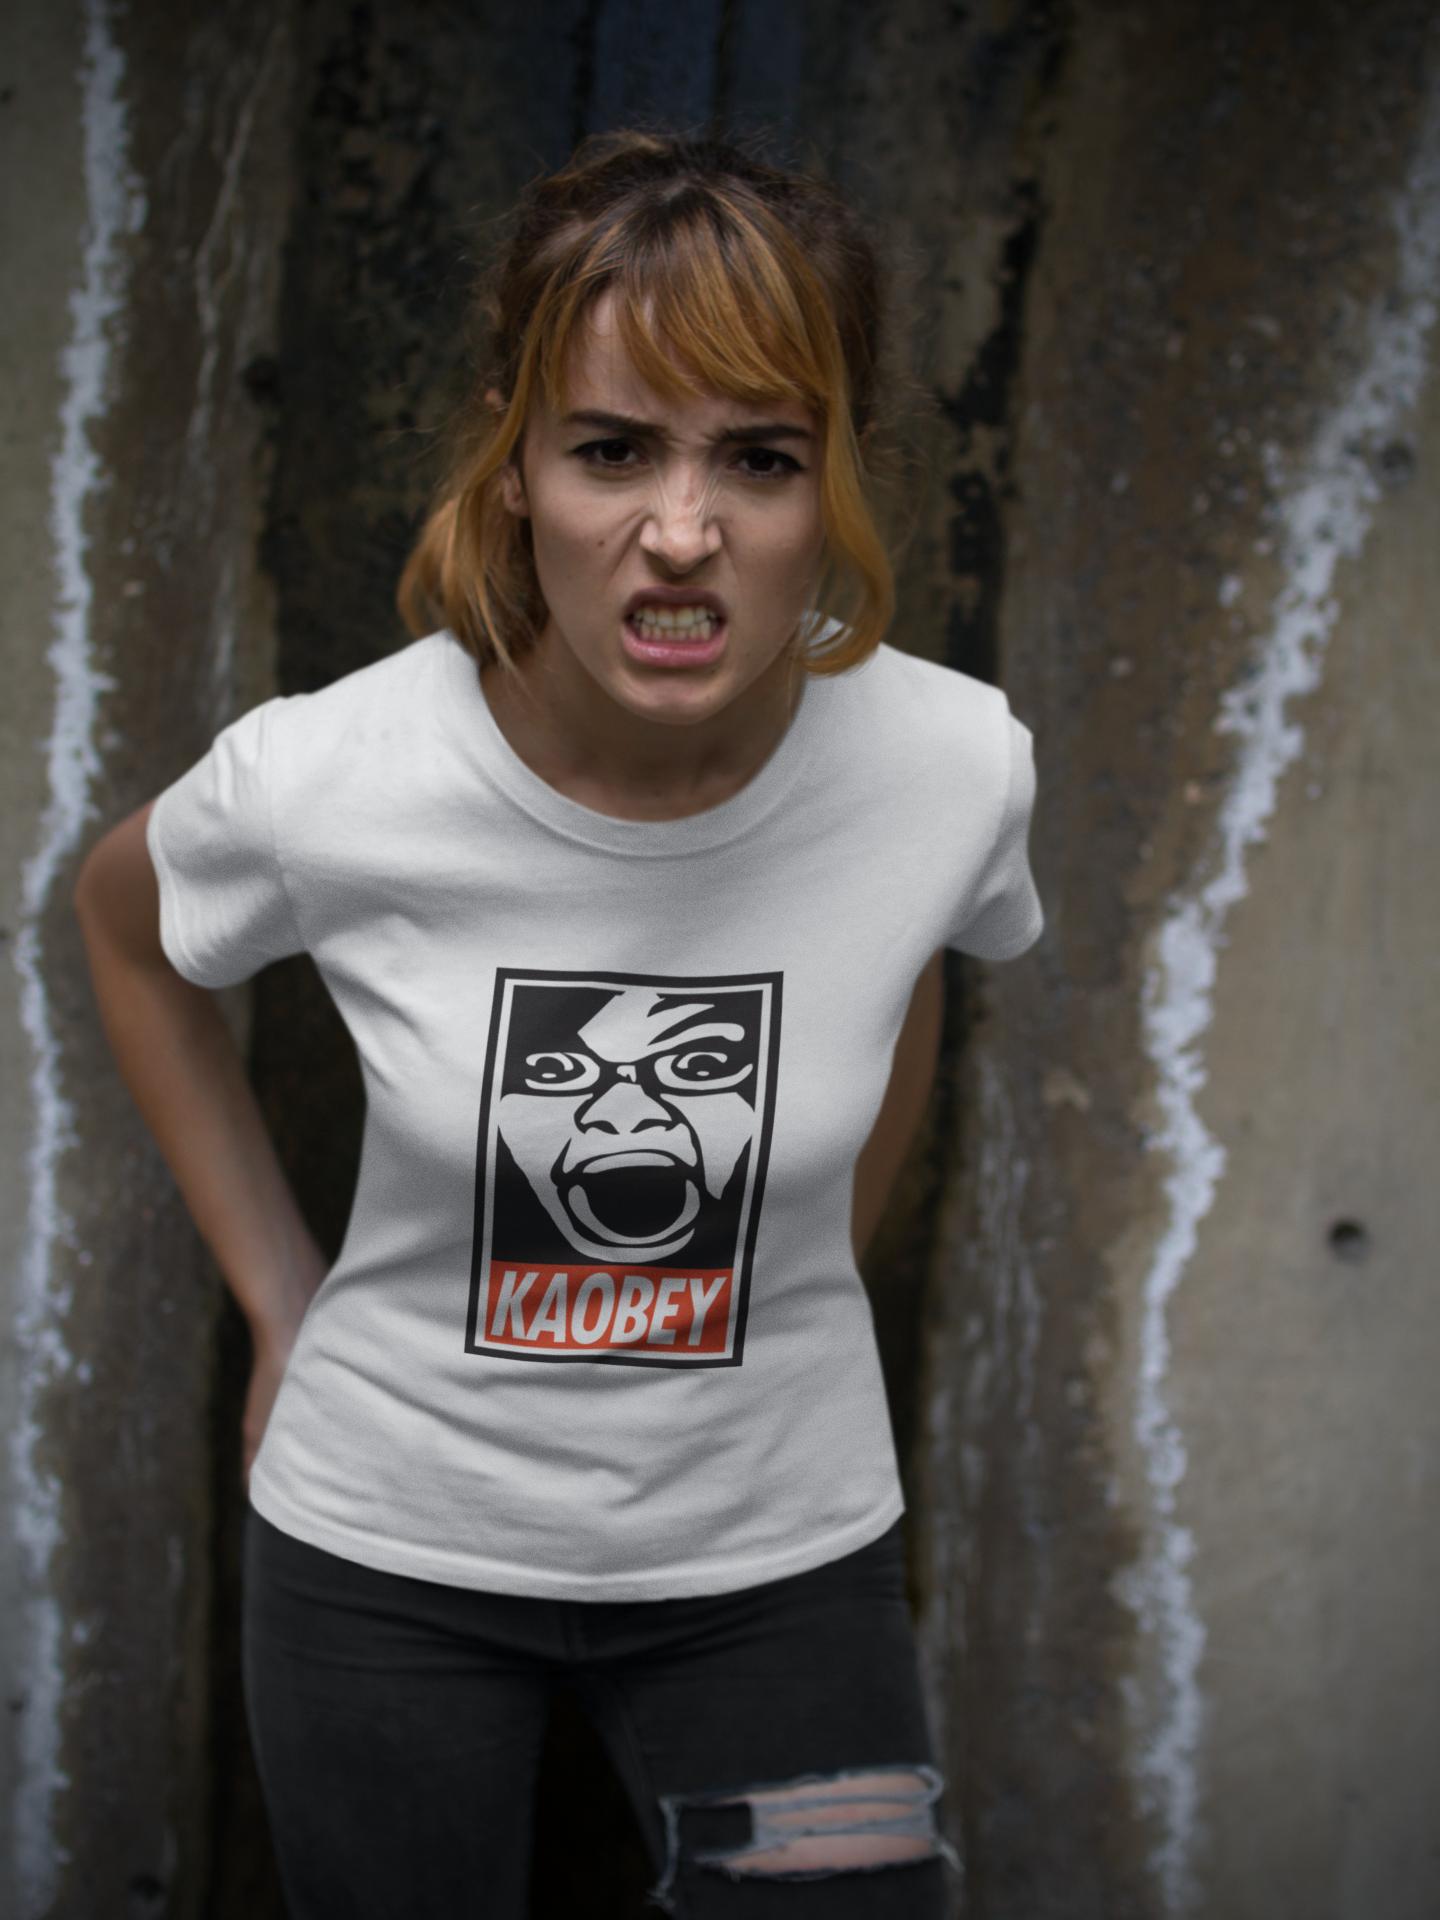 KaoBey Crew Neck S-Sleeve T-shirt